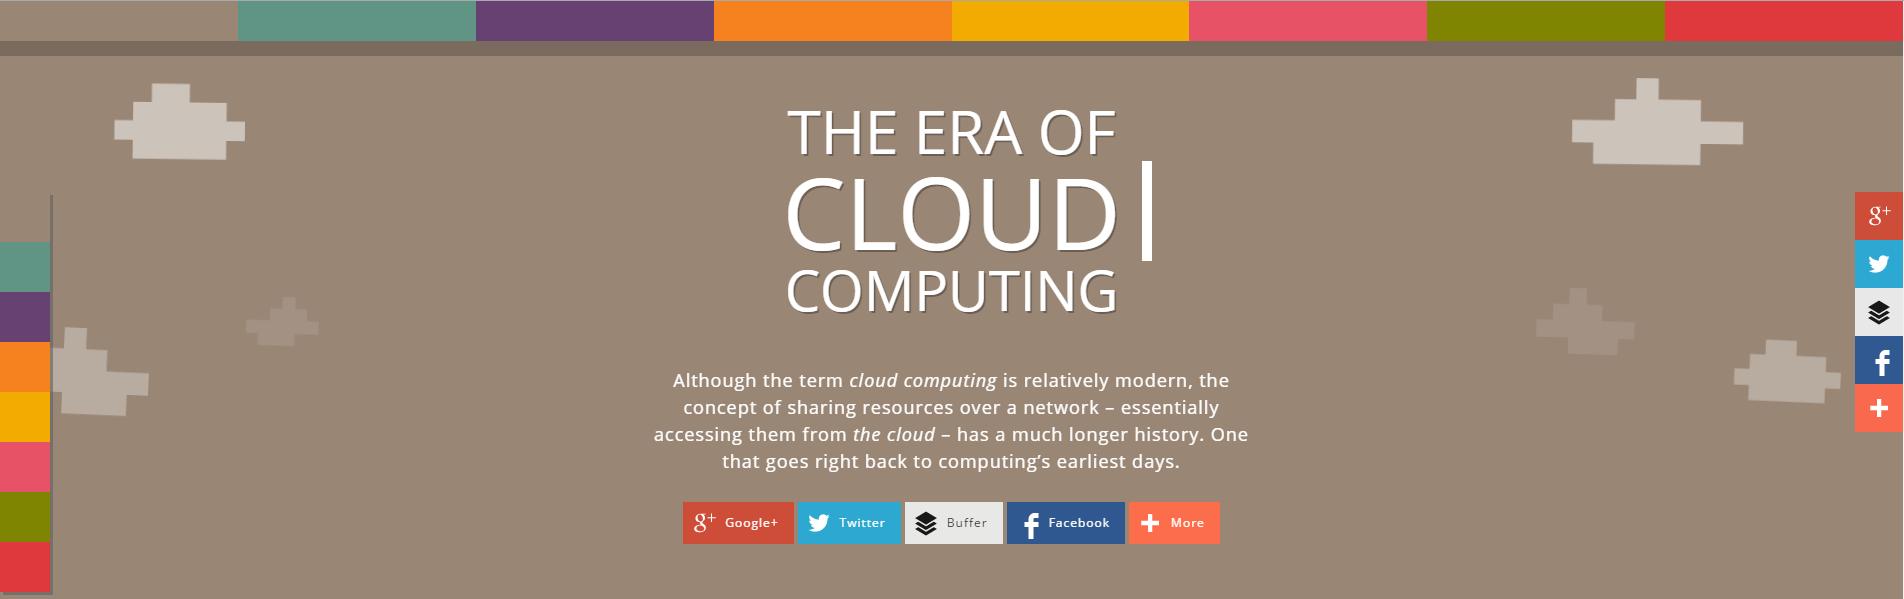 cloud data warehousing interactive timeline